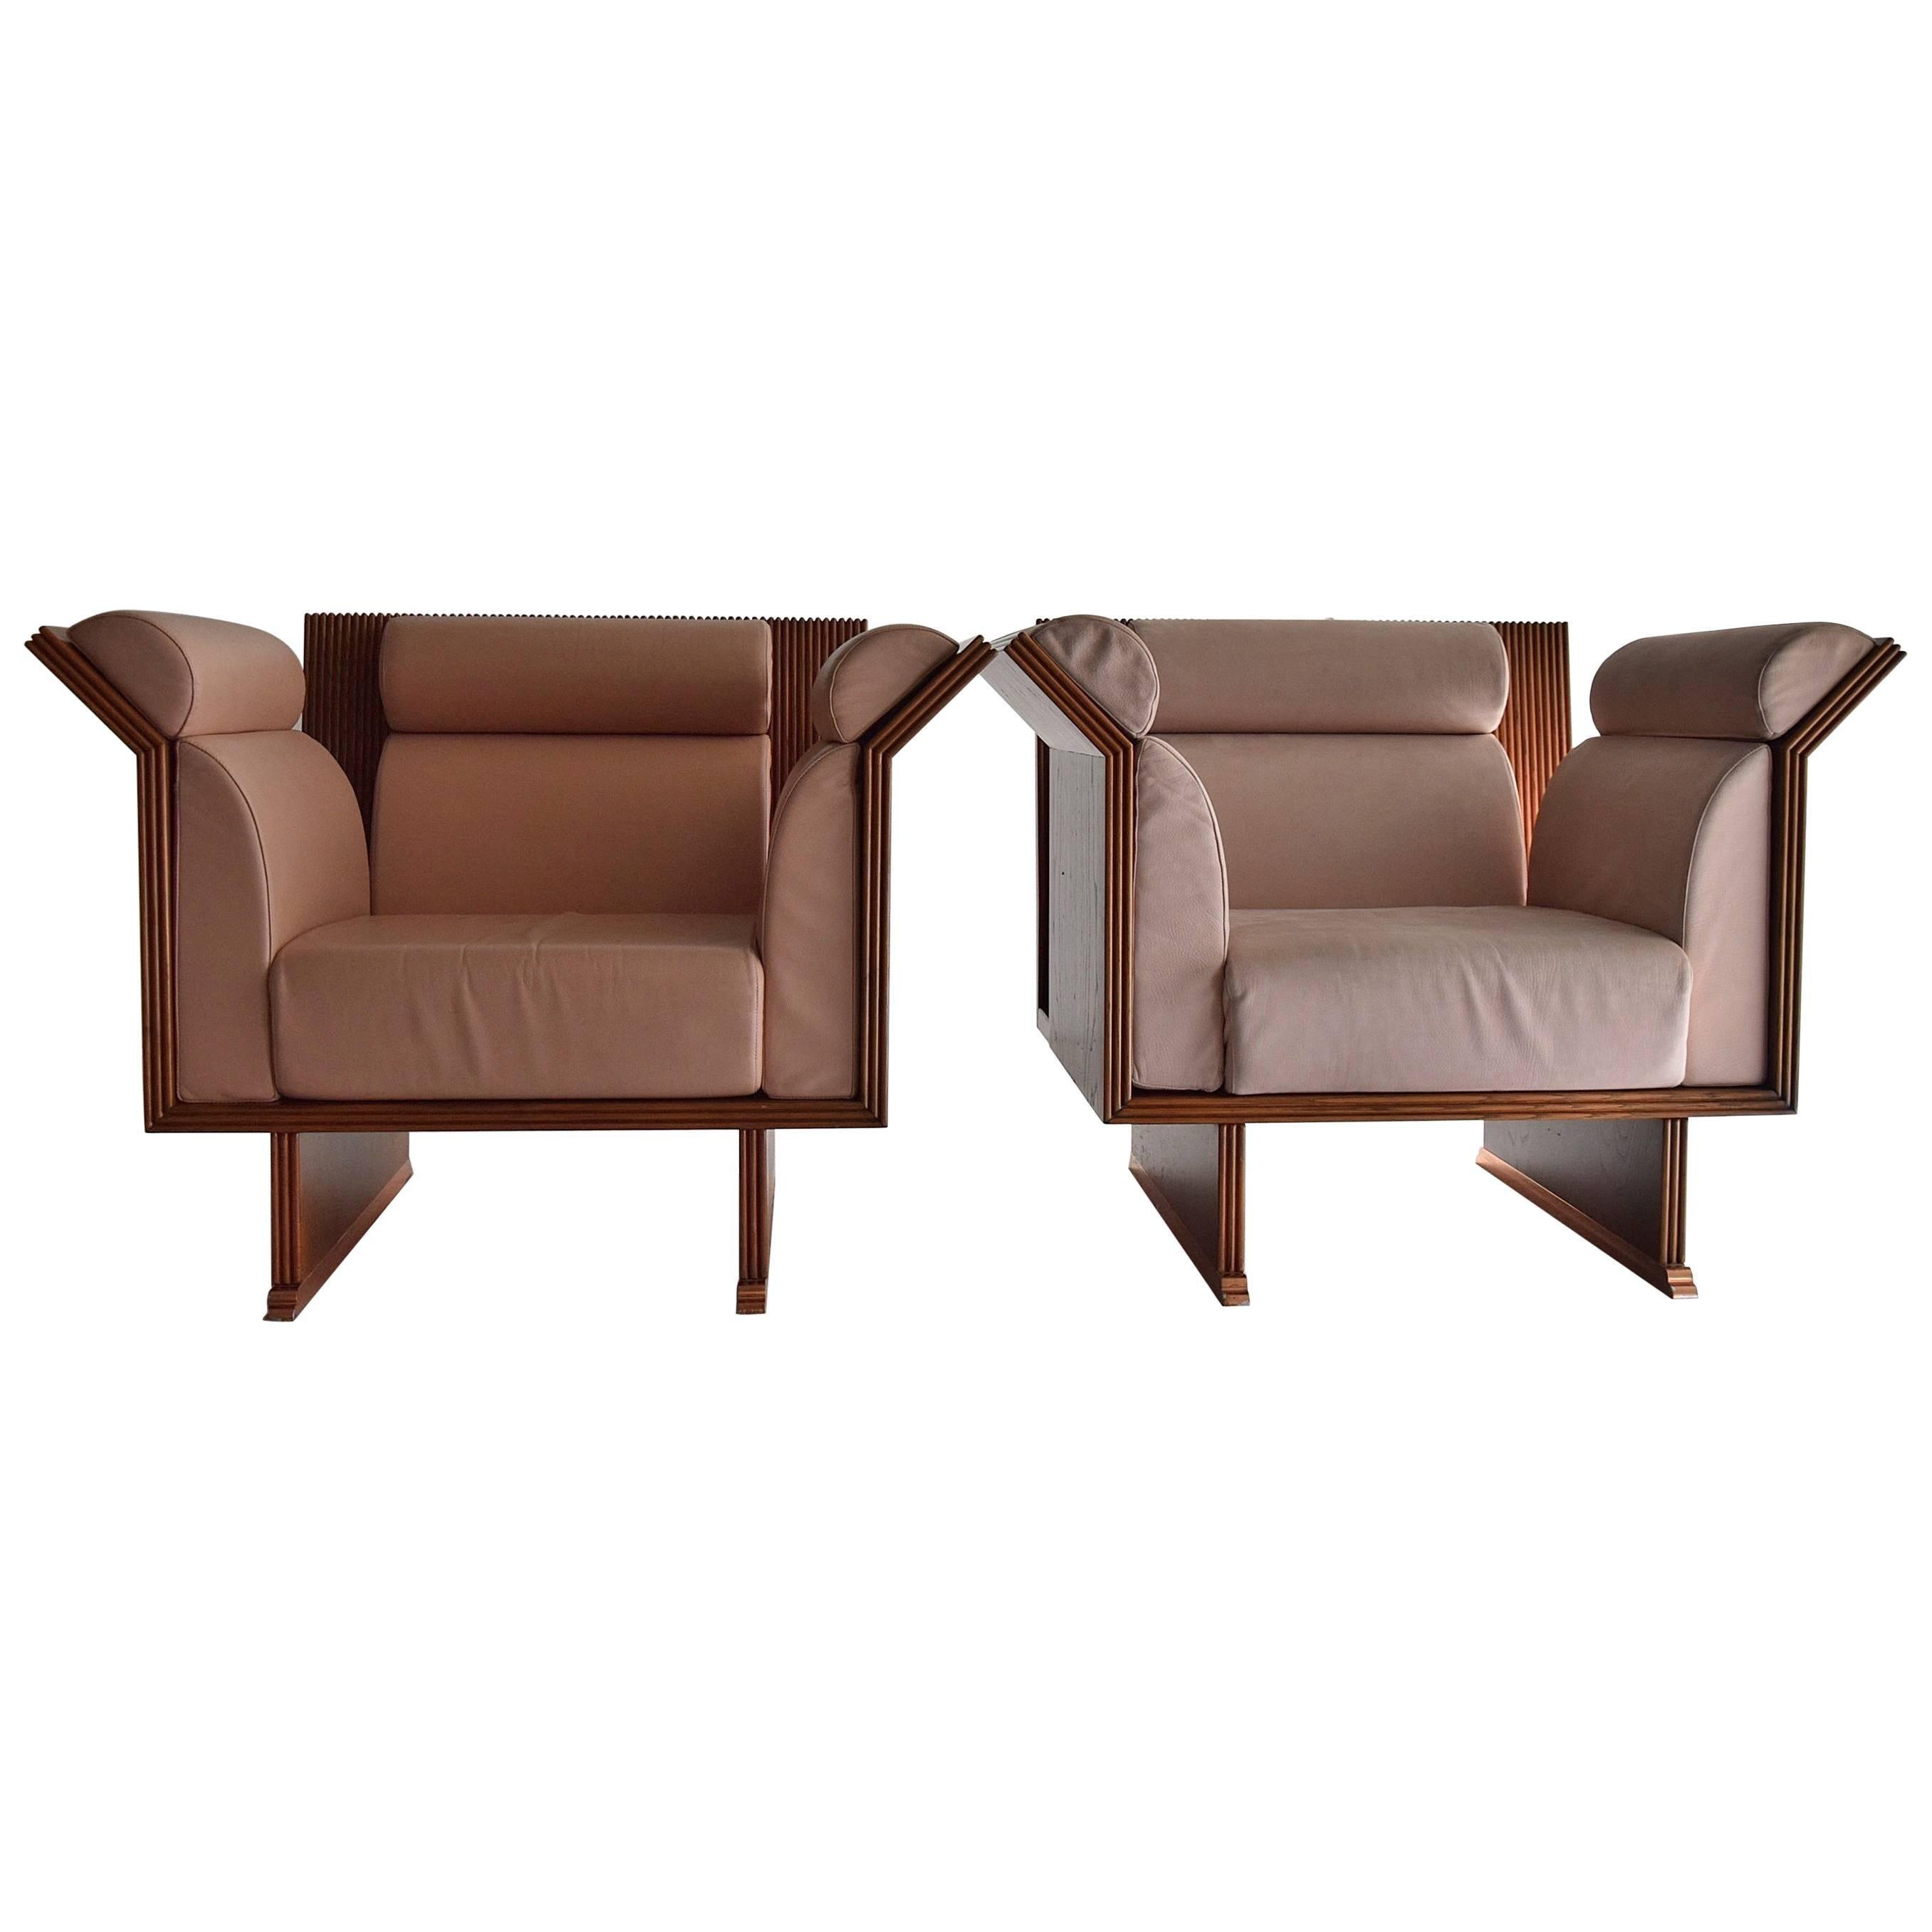 Post Modern Mahogany Arm Chairs by Ugo La Pietra